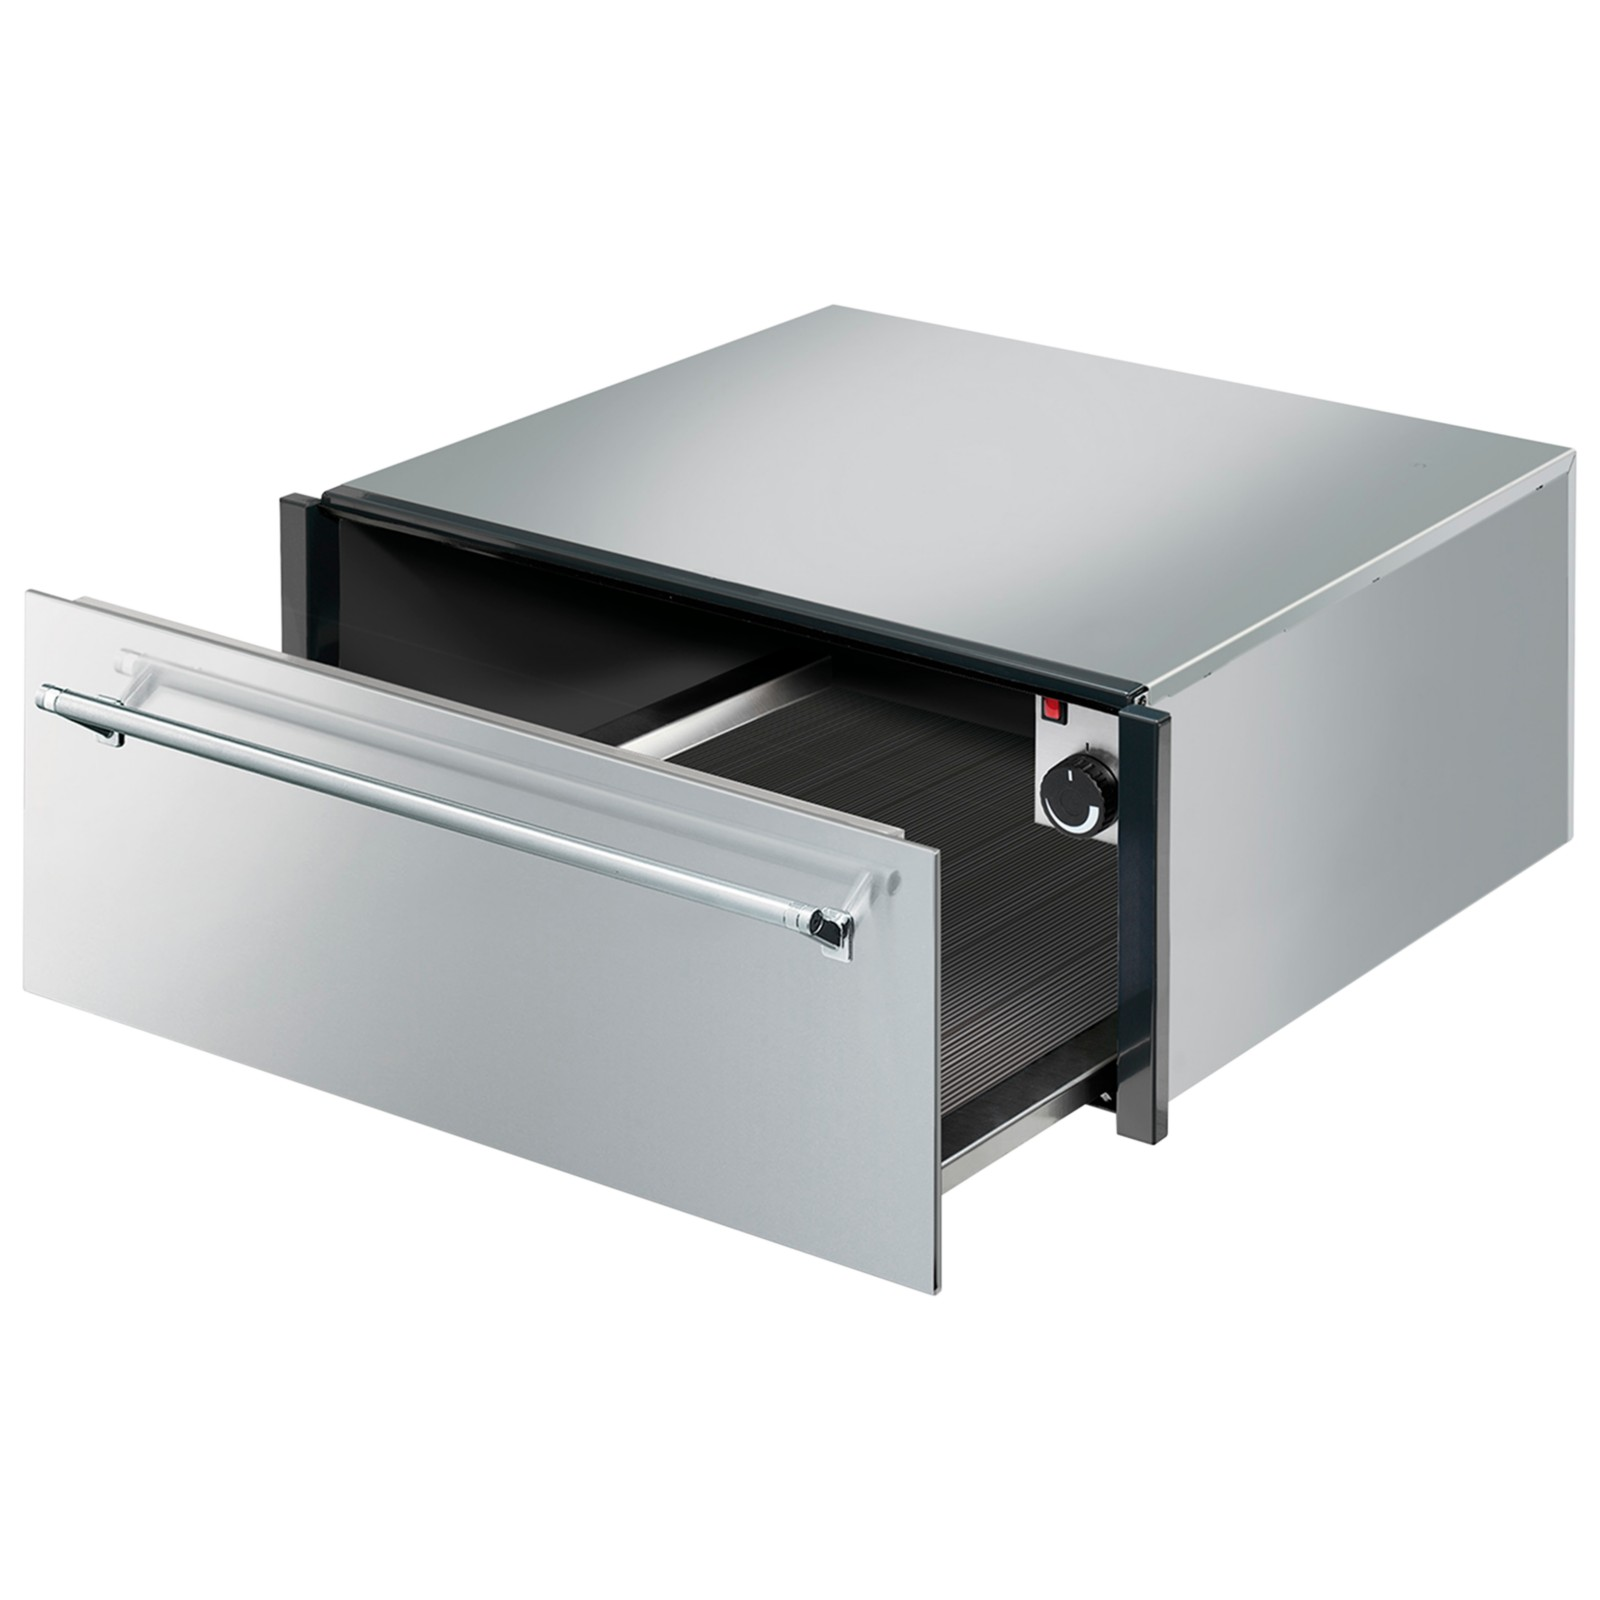 Smeg CT3029X Integrated Warming Drawer